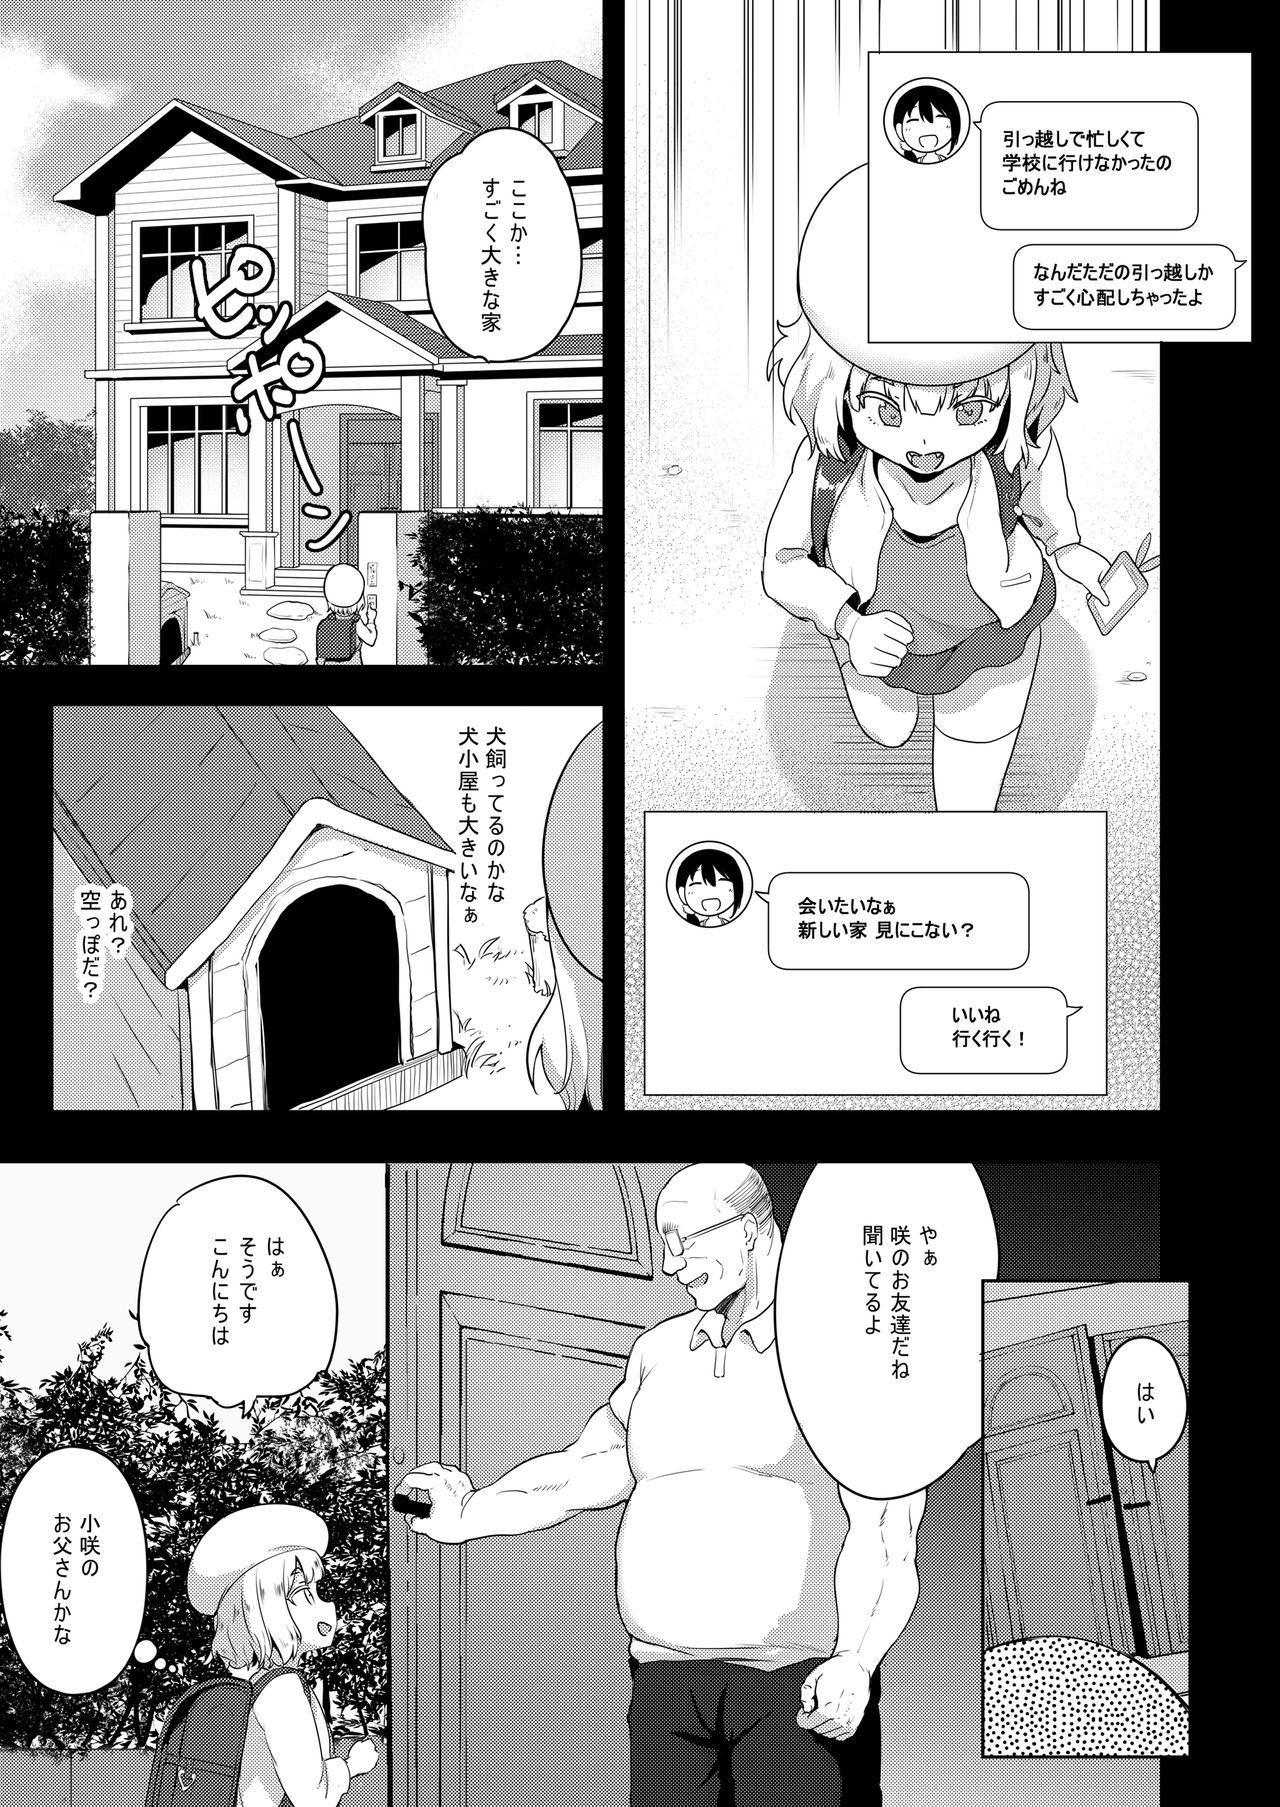 Seiyouken Choukyou 2 6